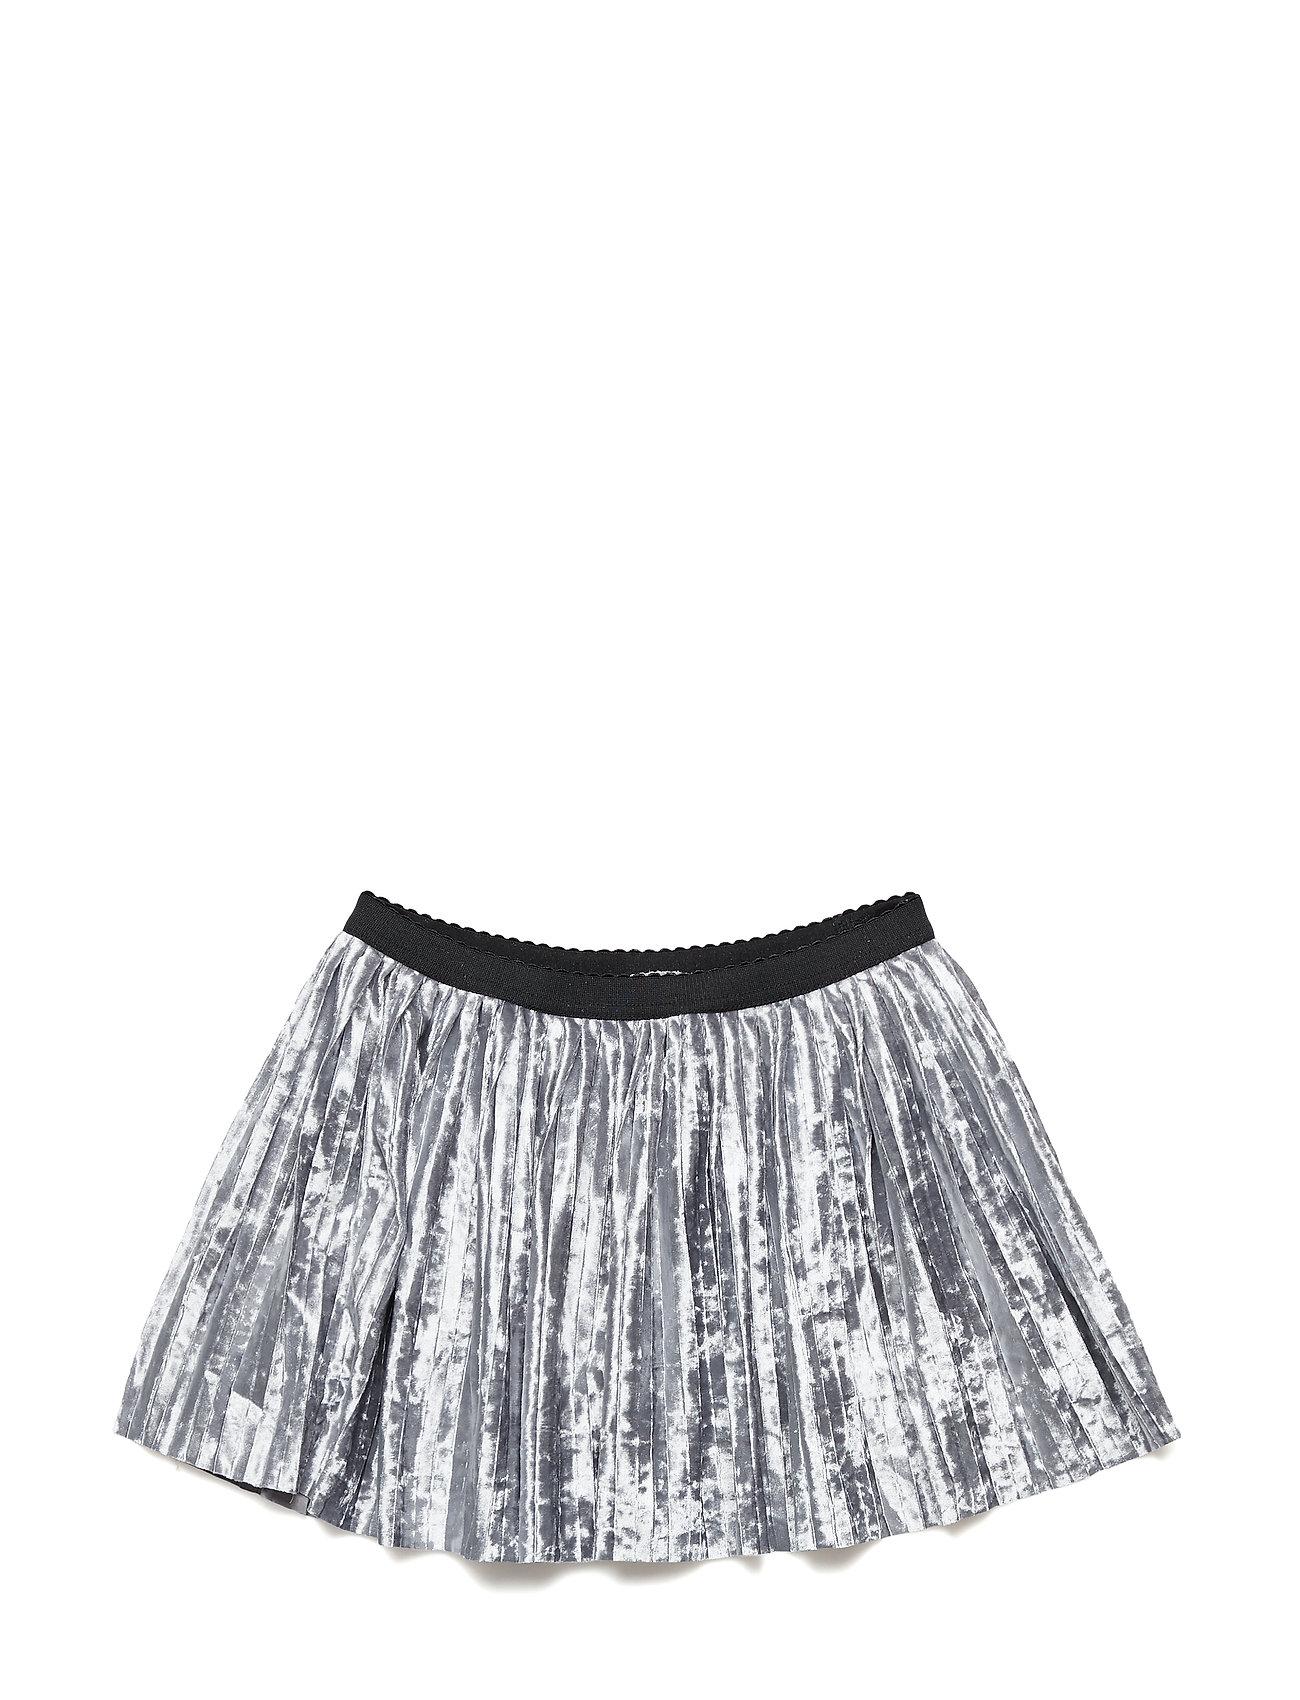 Polarn O. Pyret Skirt Pleated Preschool